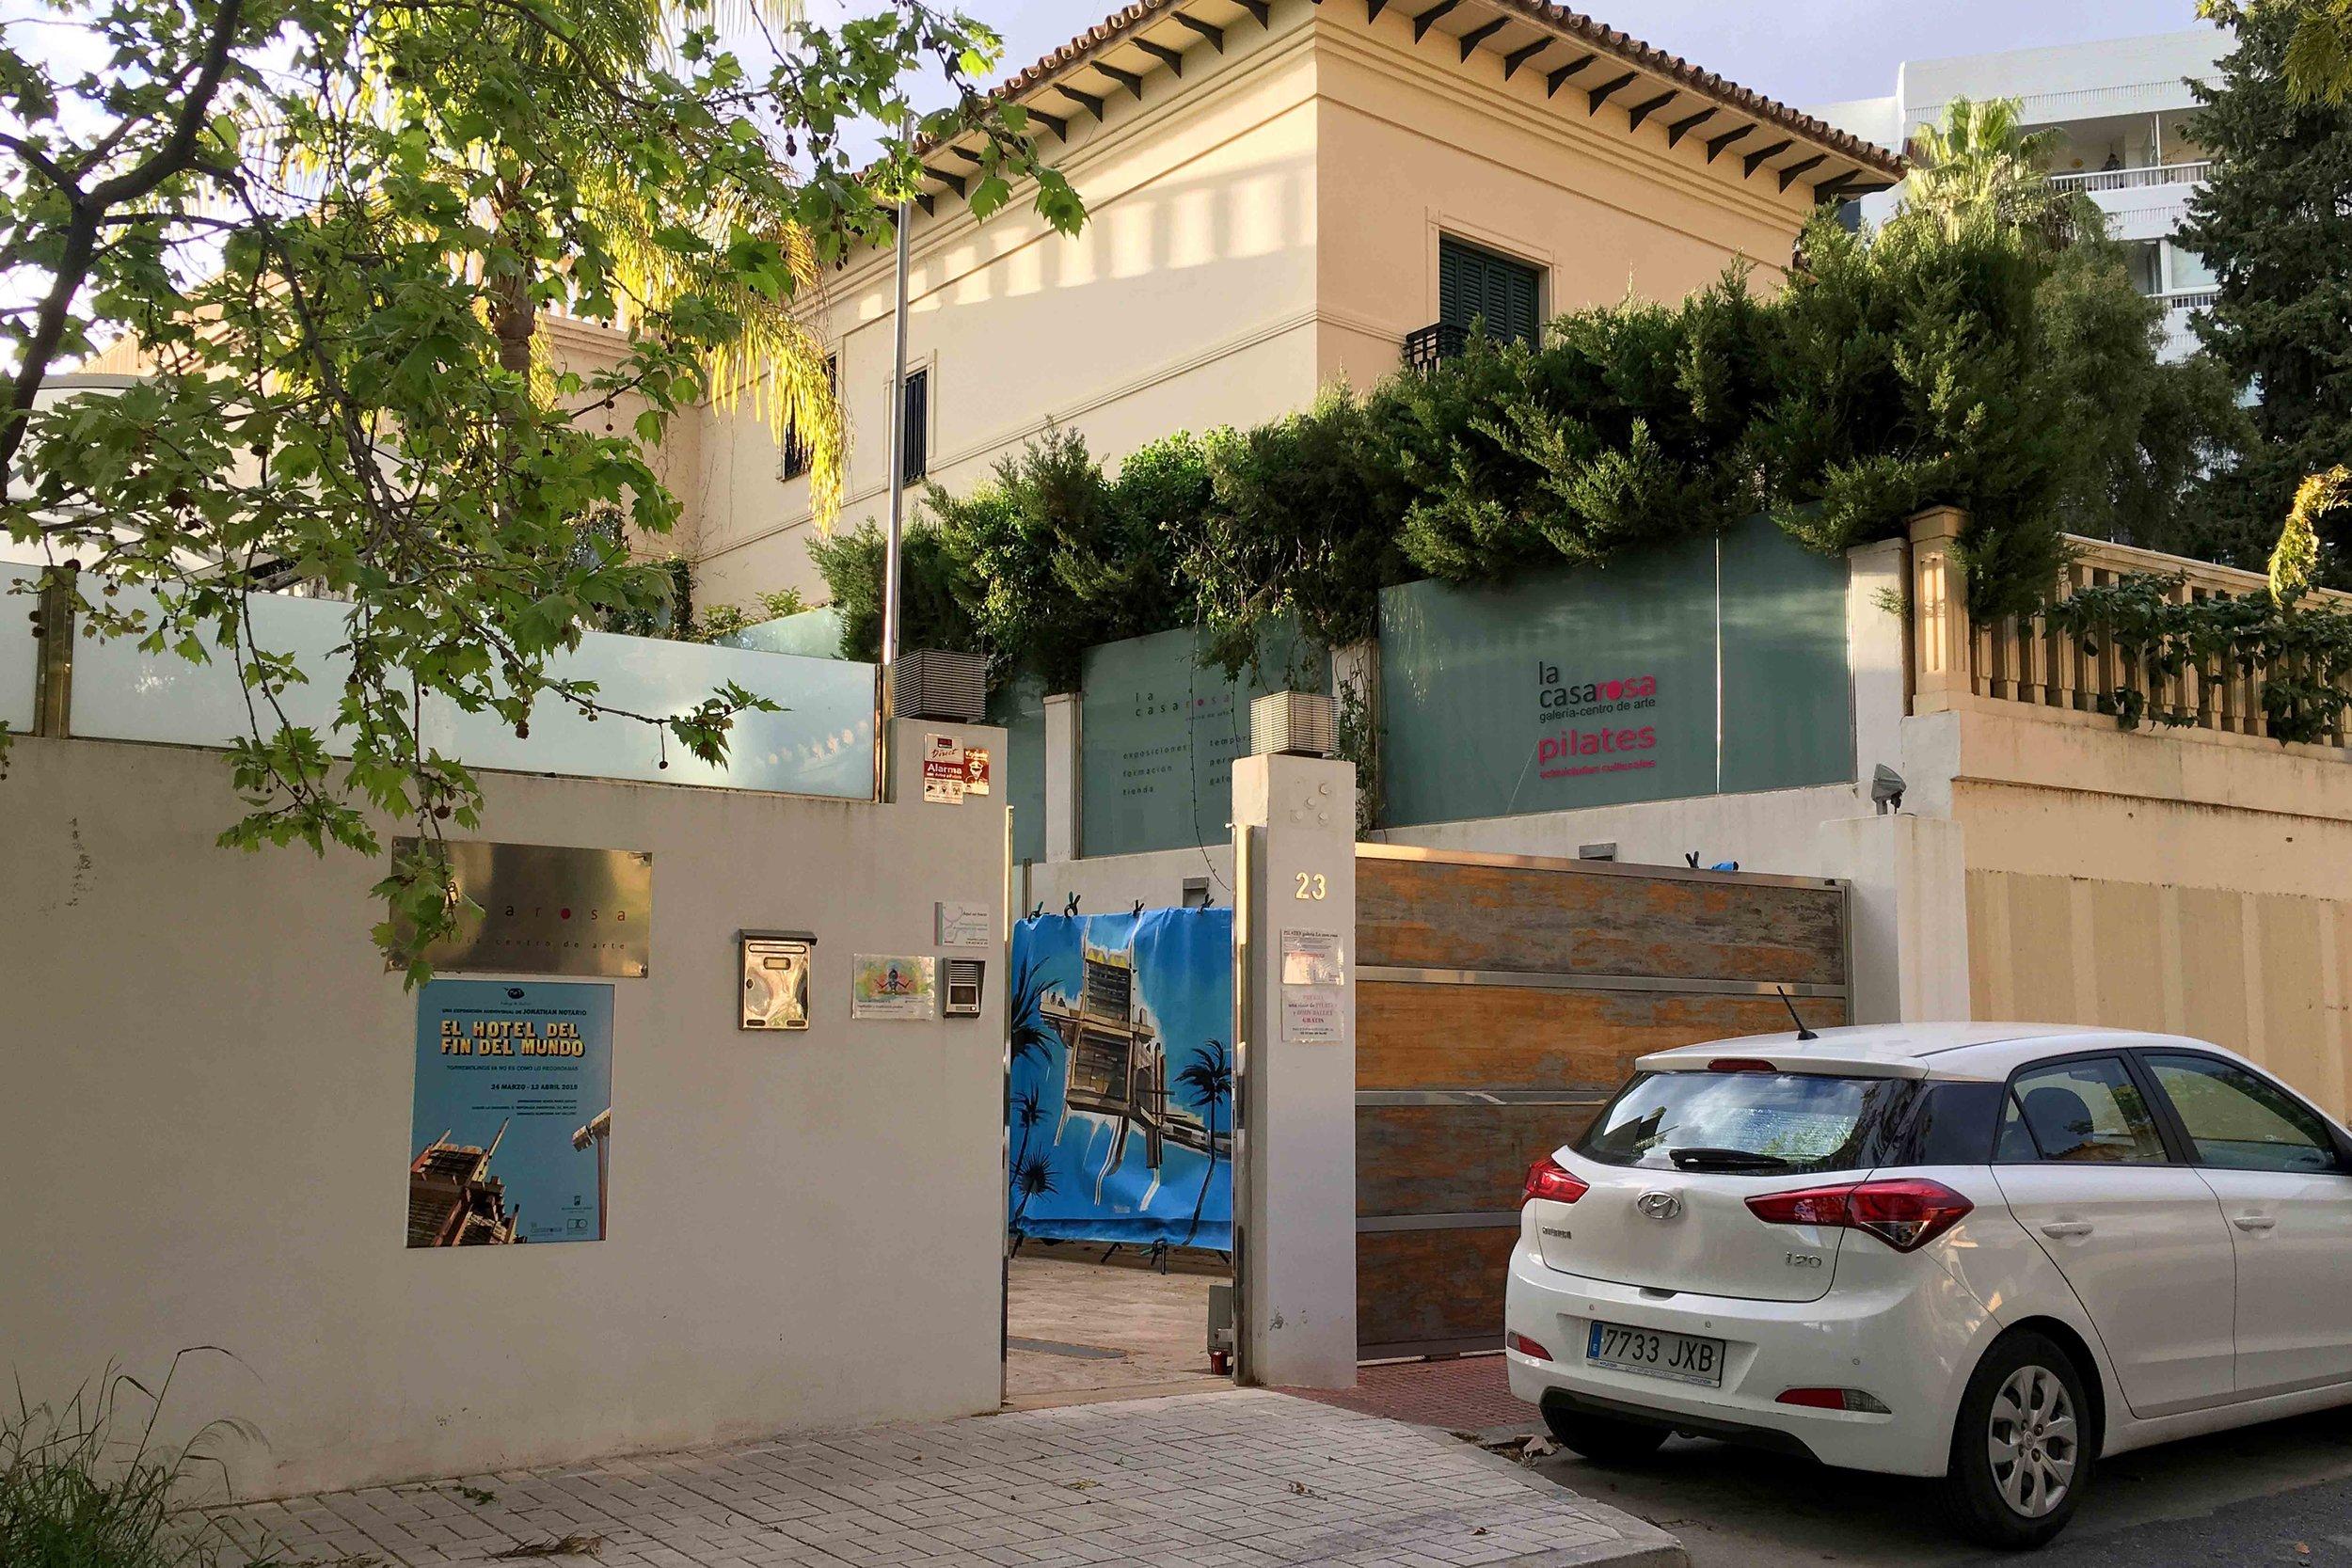 el-hotel-del-fin-del-mundo-jonathan-notario-eldevenir-art-gallery-maf-0.jpg